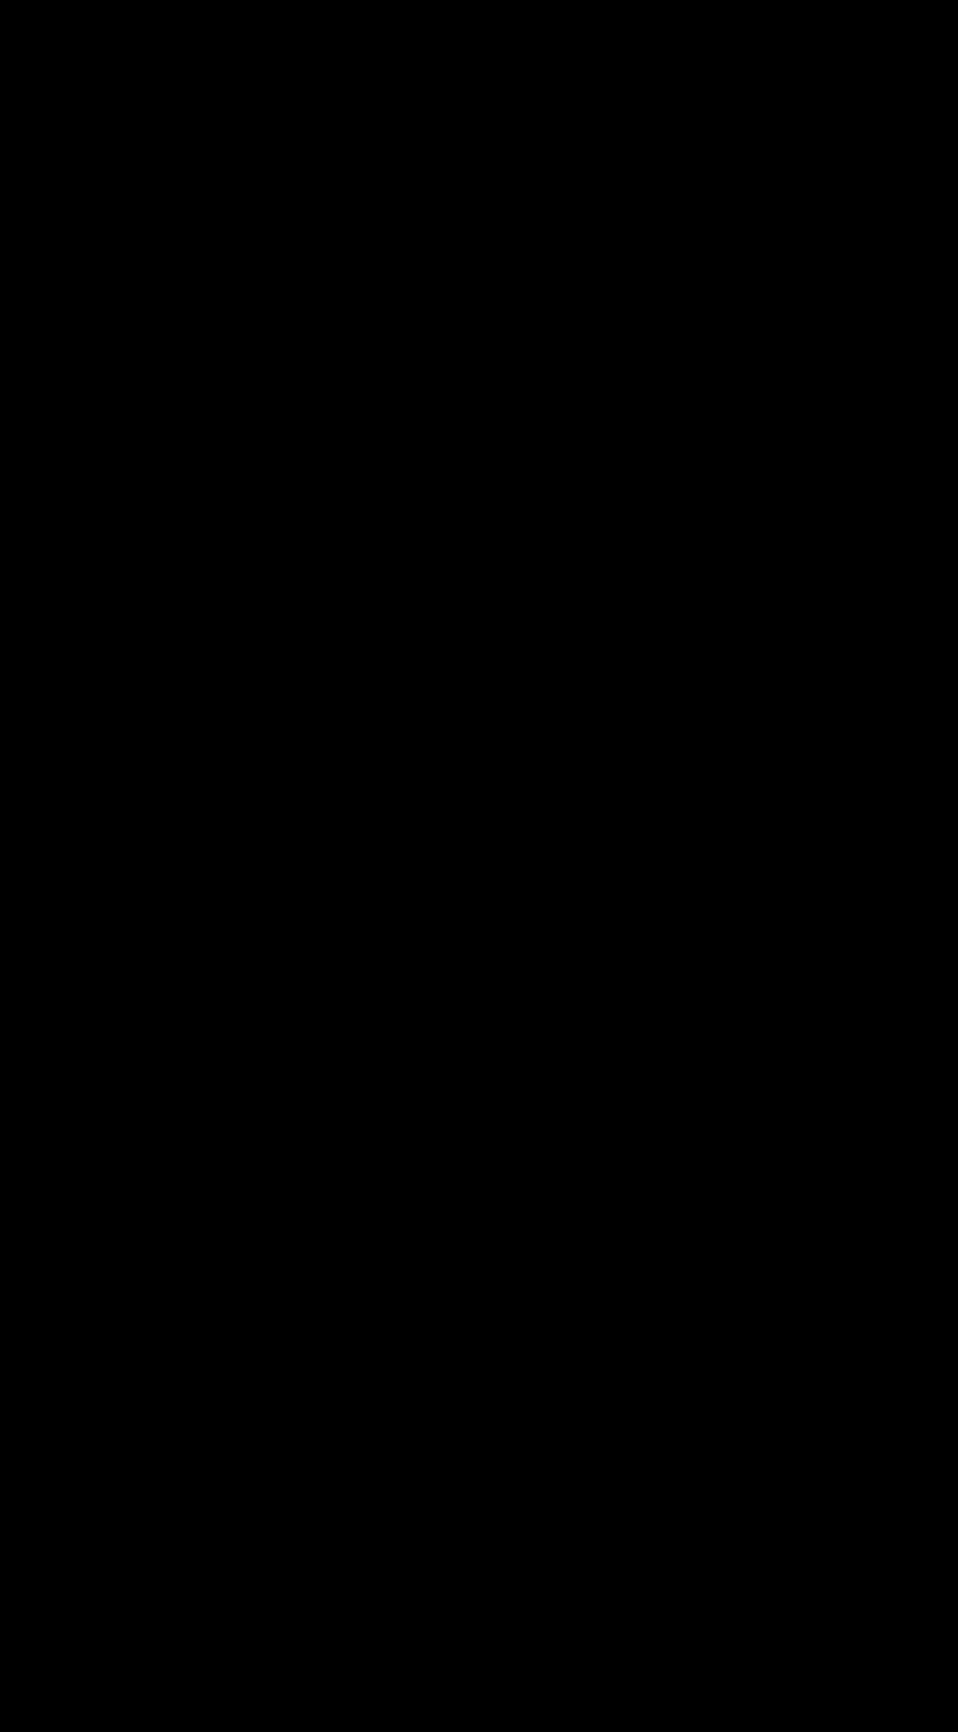 958x1732 Public Domain Clip Art Image Illustration Of A Female Silhouette